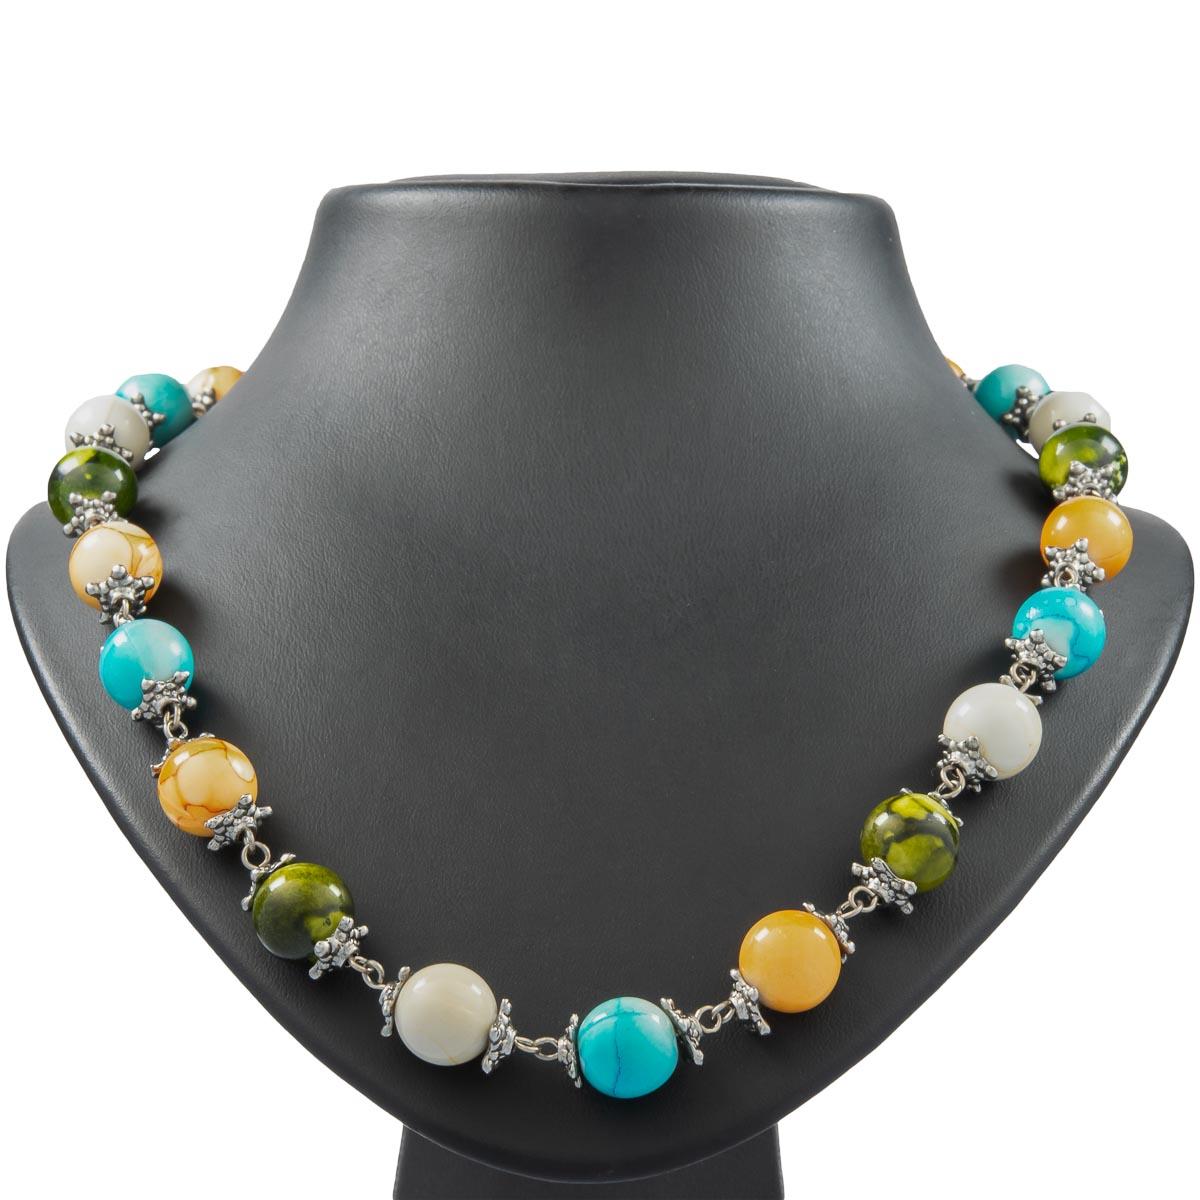 Damen Design Halskette RP002